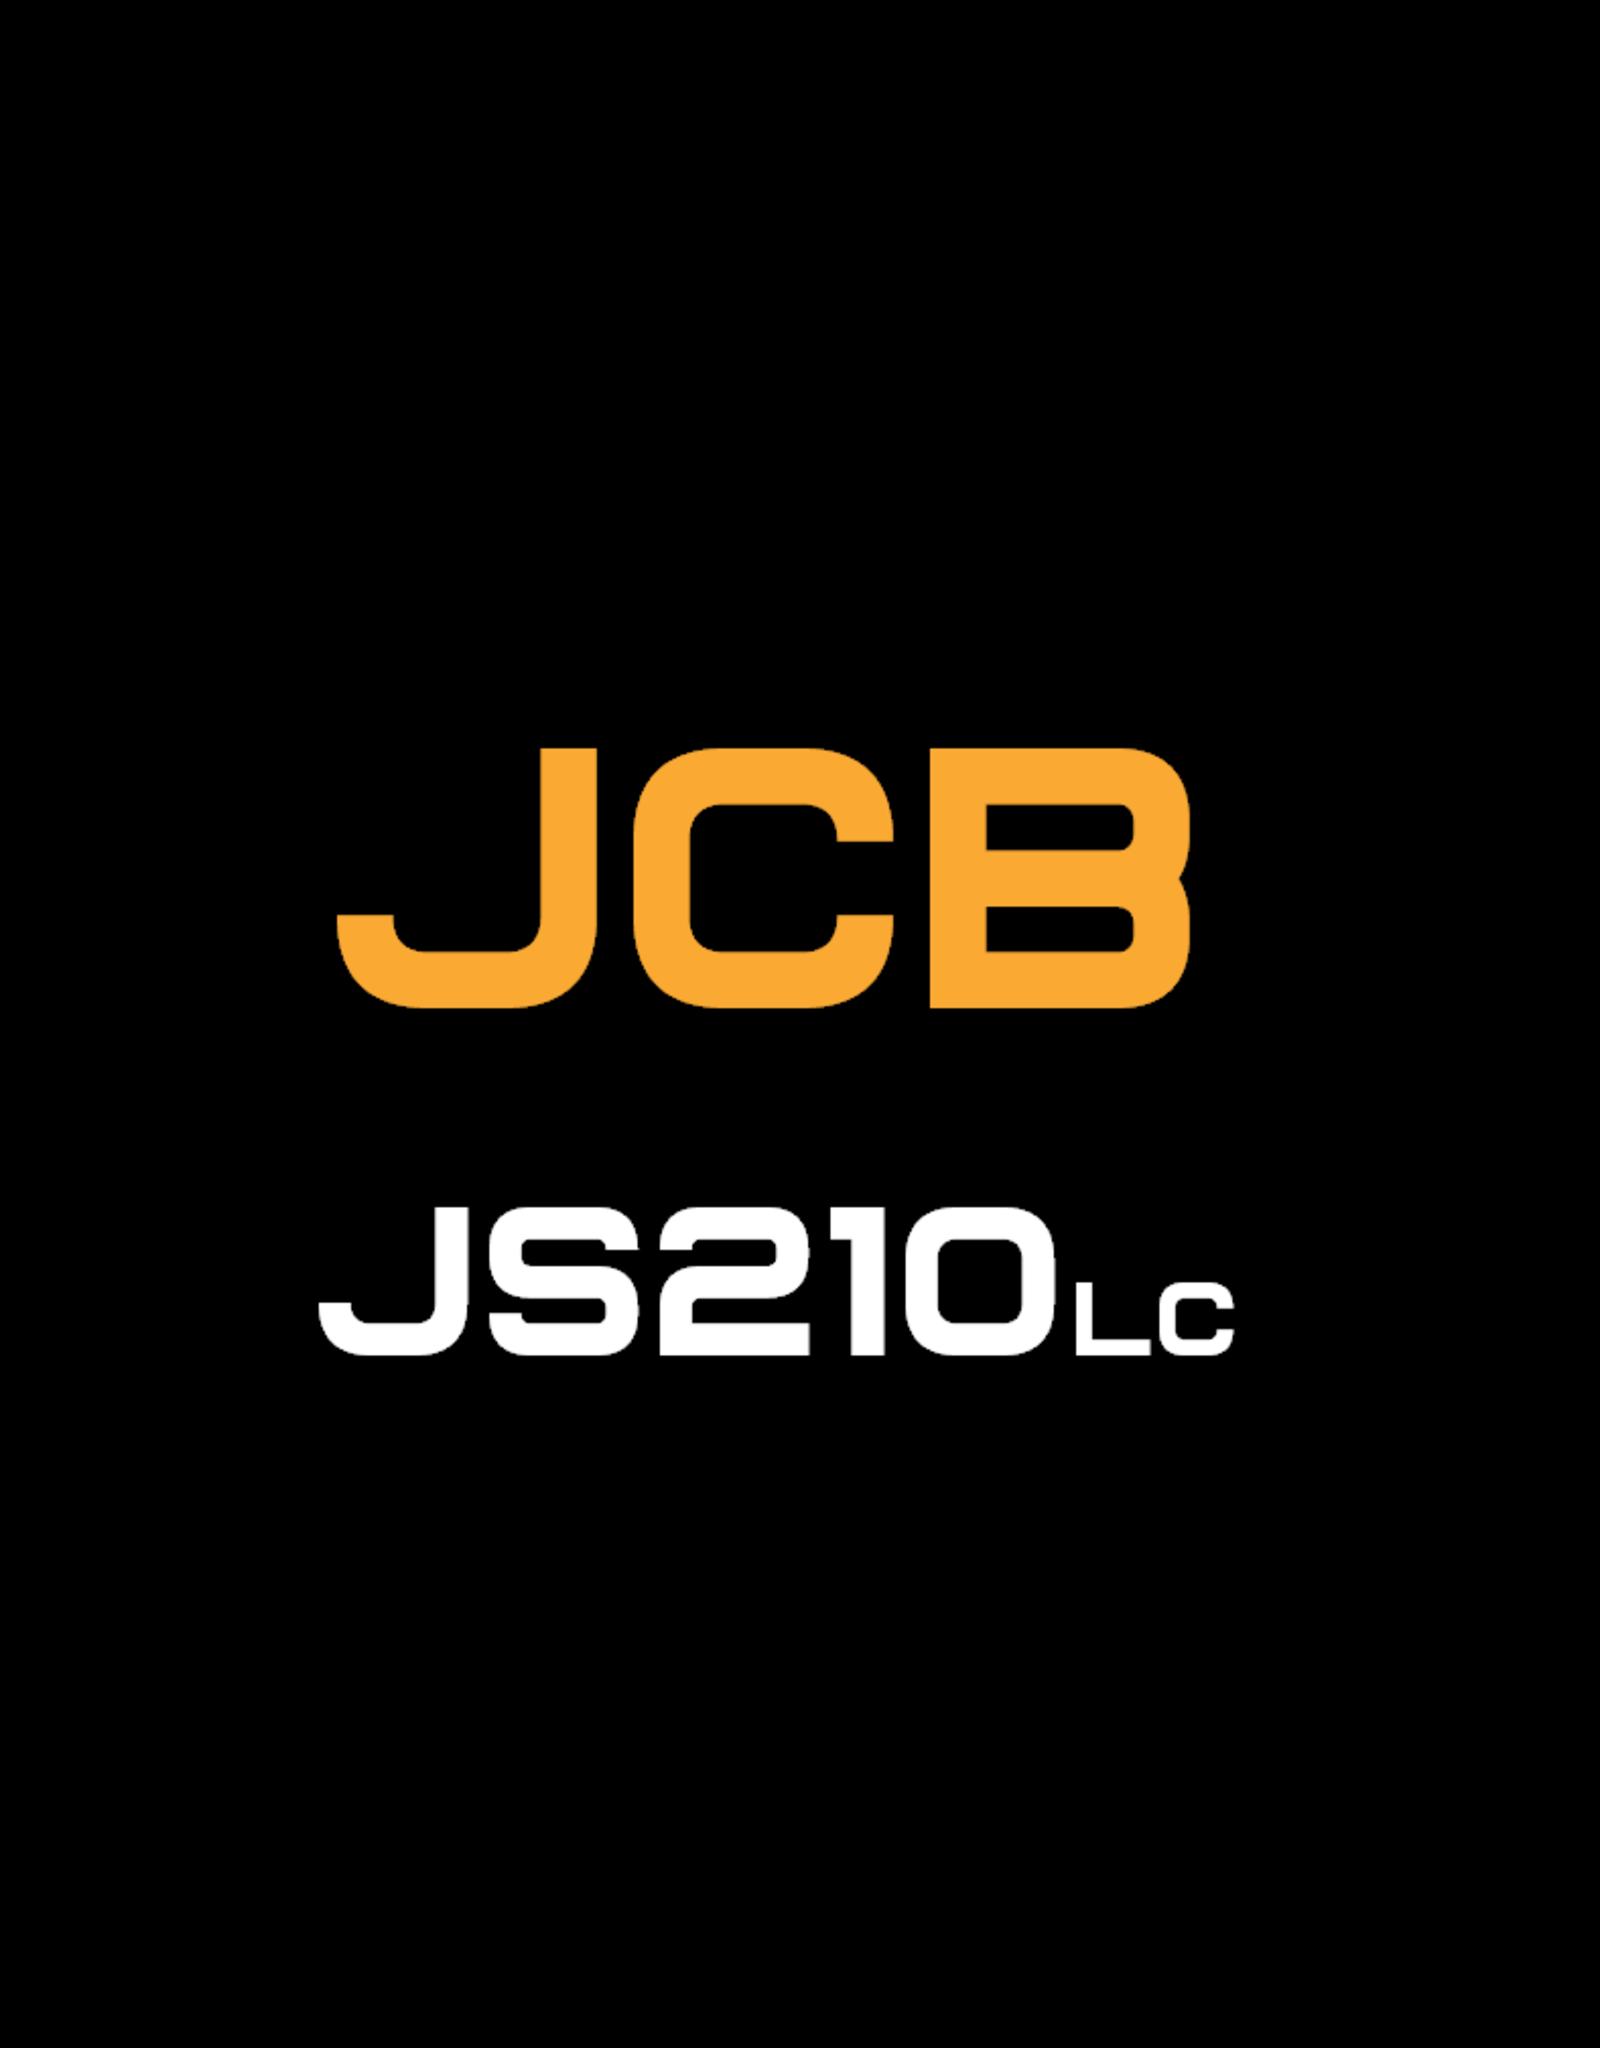 Echle Hartstahl GmbH FOPS für JCB JS210LC